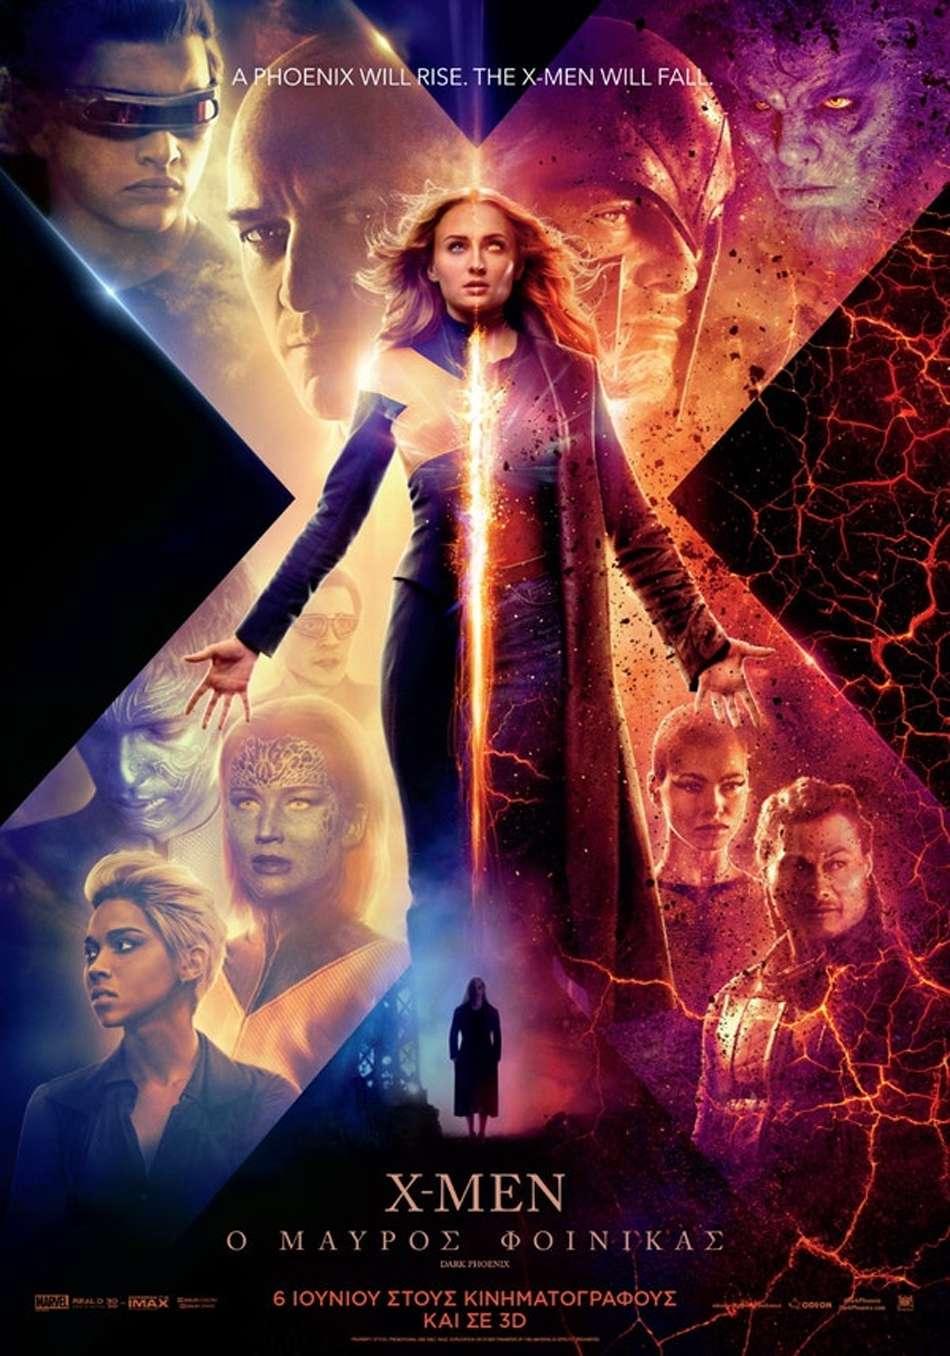 X-Men: Ο Μαύρος Φοίνικας (X-Men: Dark Phoenix) - Trailer / Τρέιλερ Poster